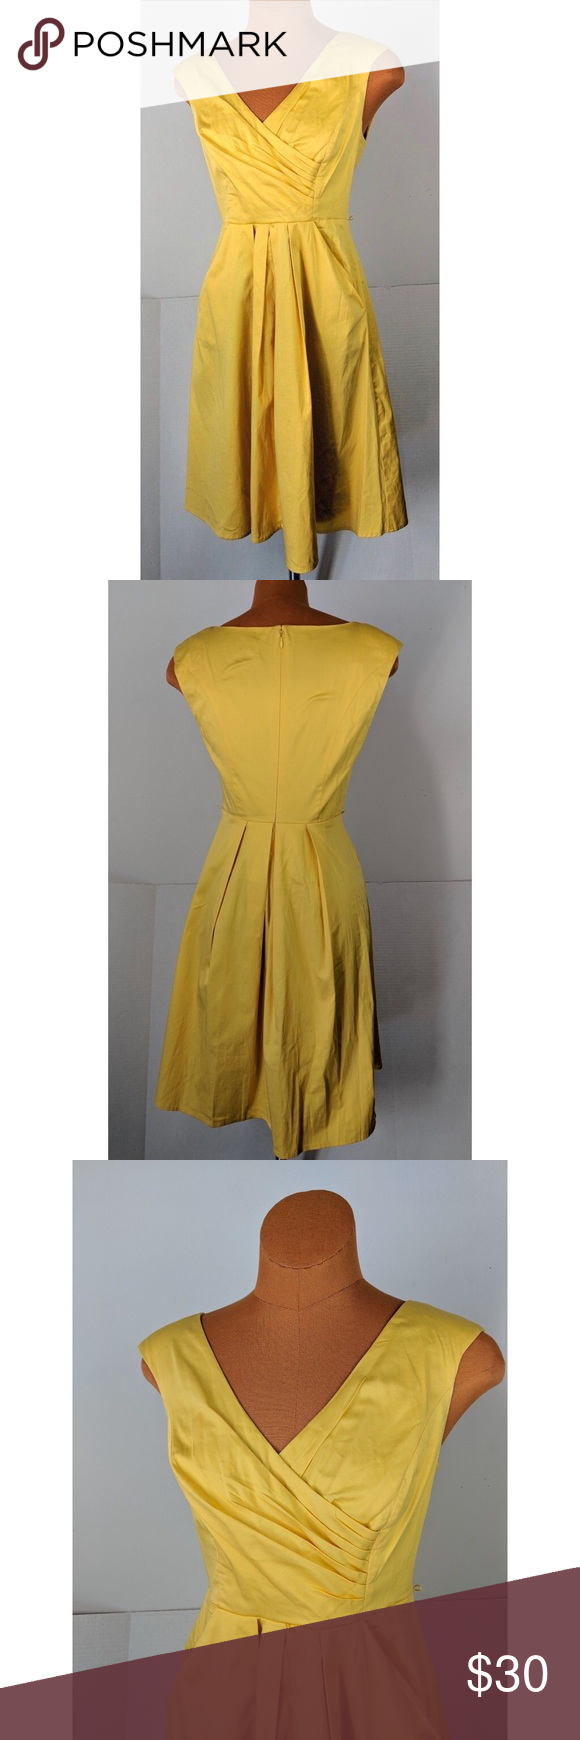 Essica simpson yellow dress yellow dress jessica simpson dresses